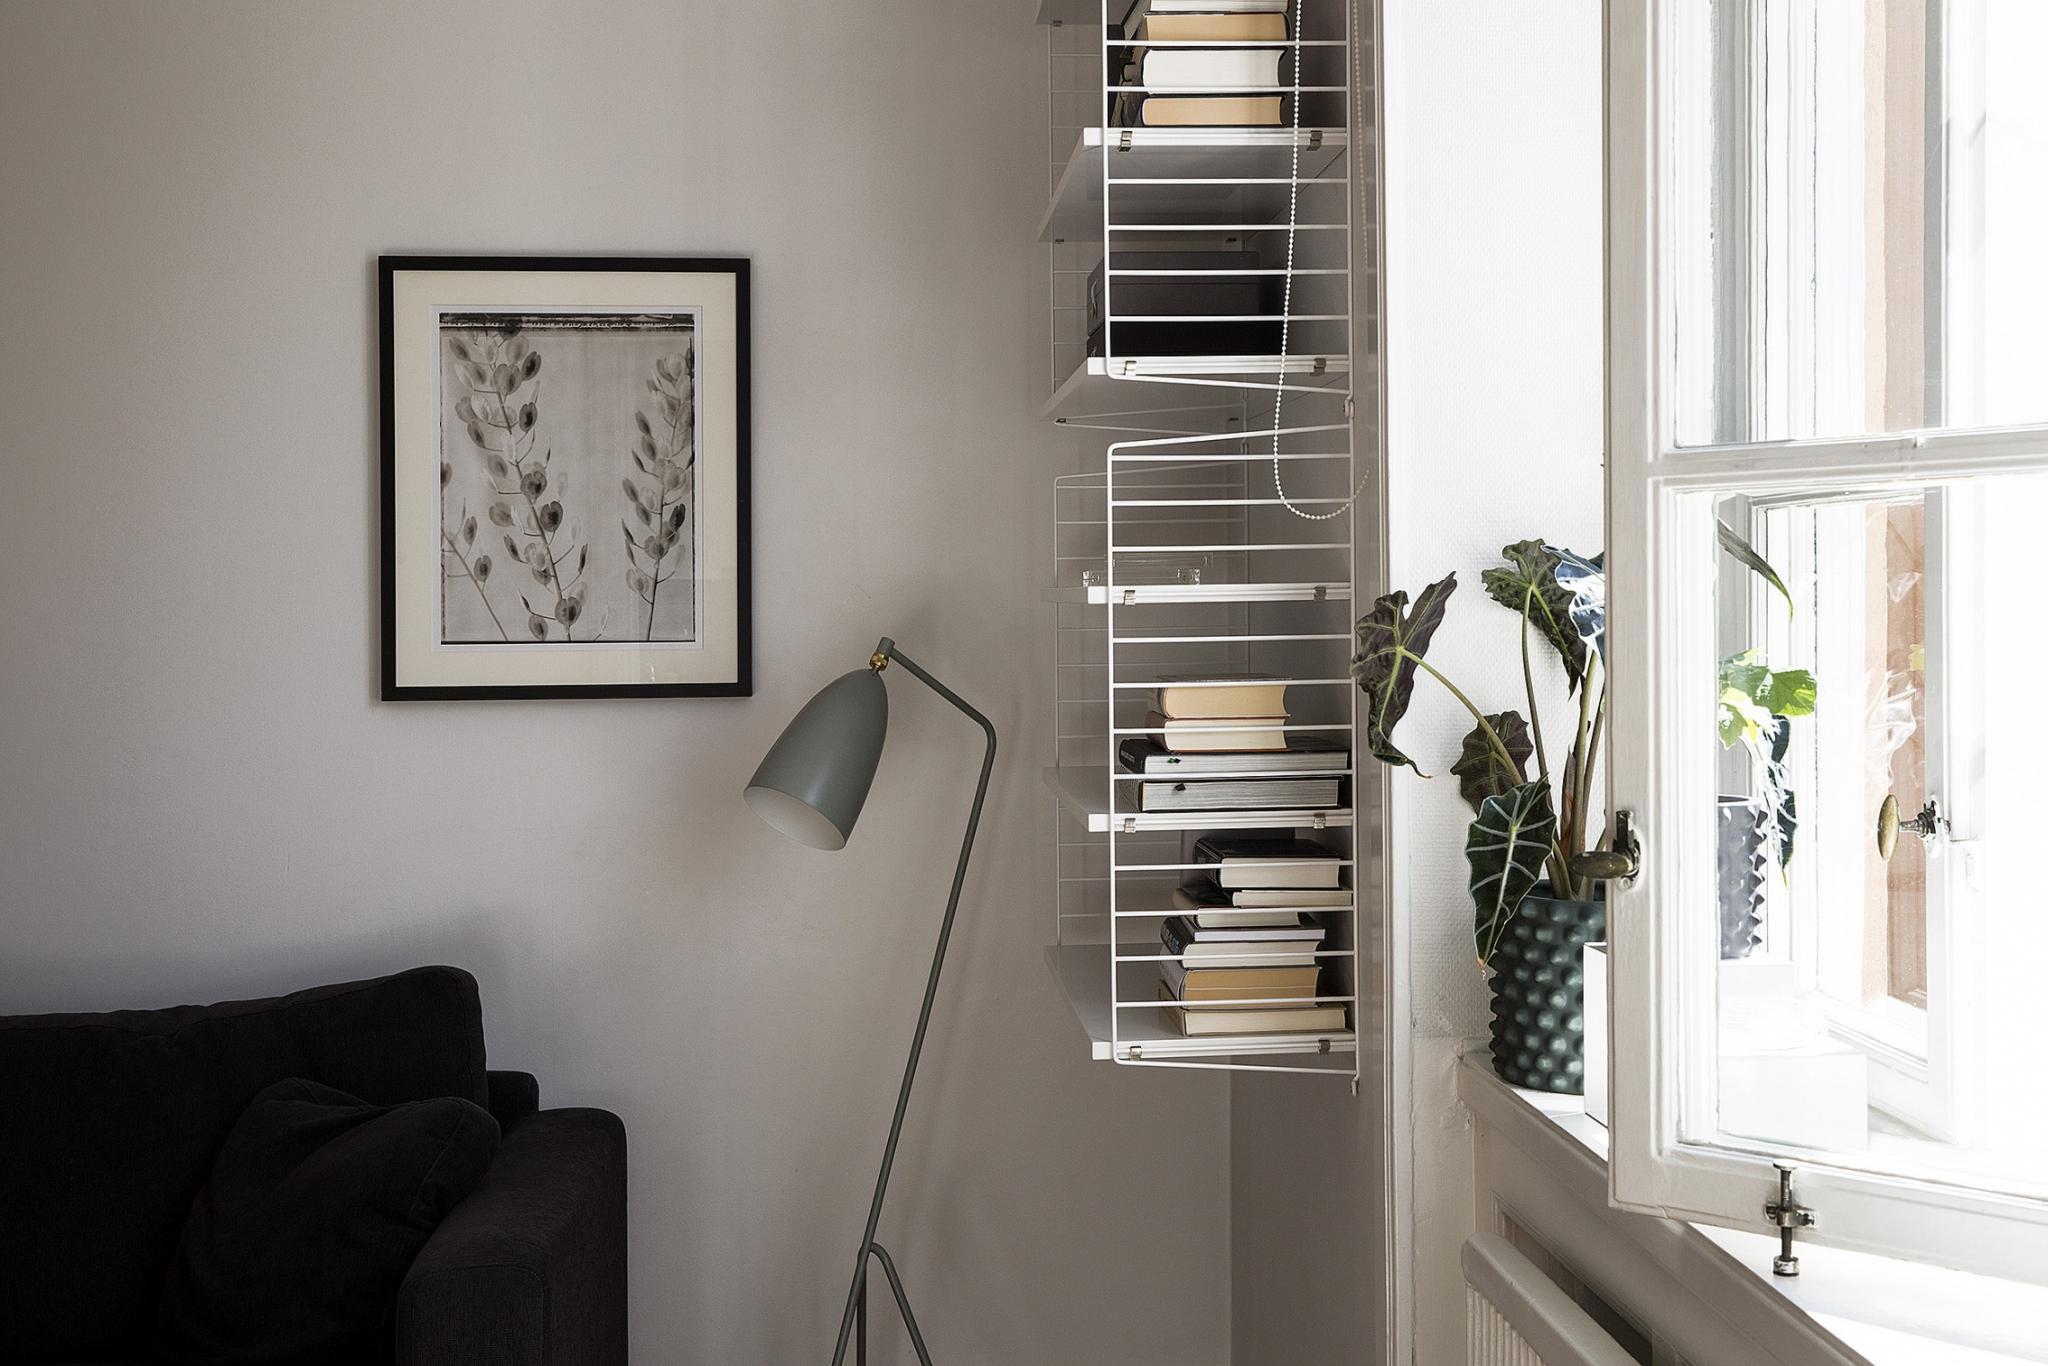 sofakrog-stue-reol-vaeghaengt-string-hvid-indrening-boligindretning ...